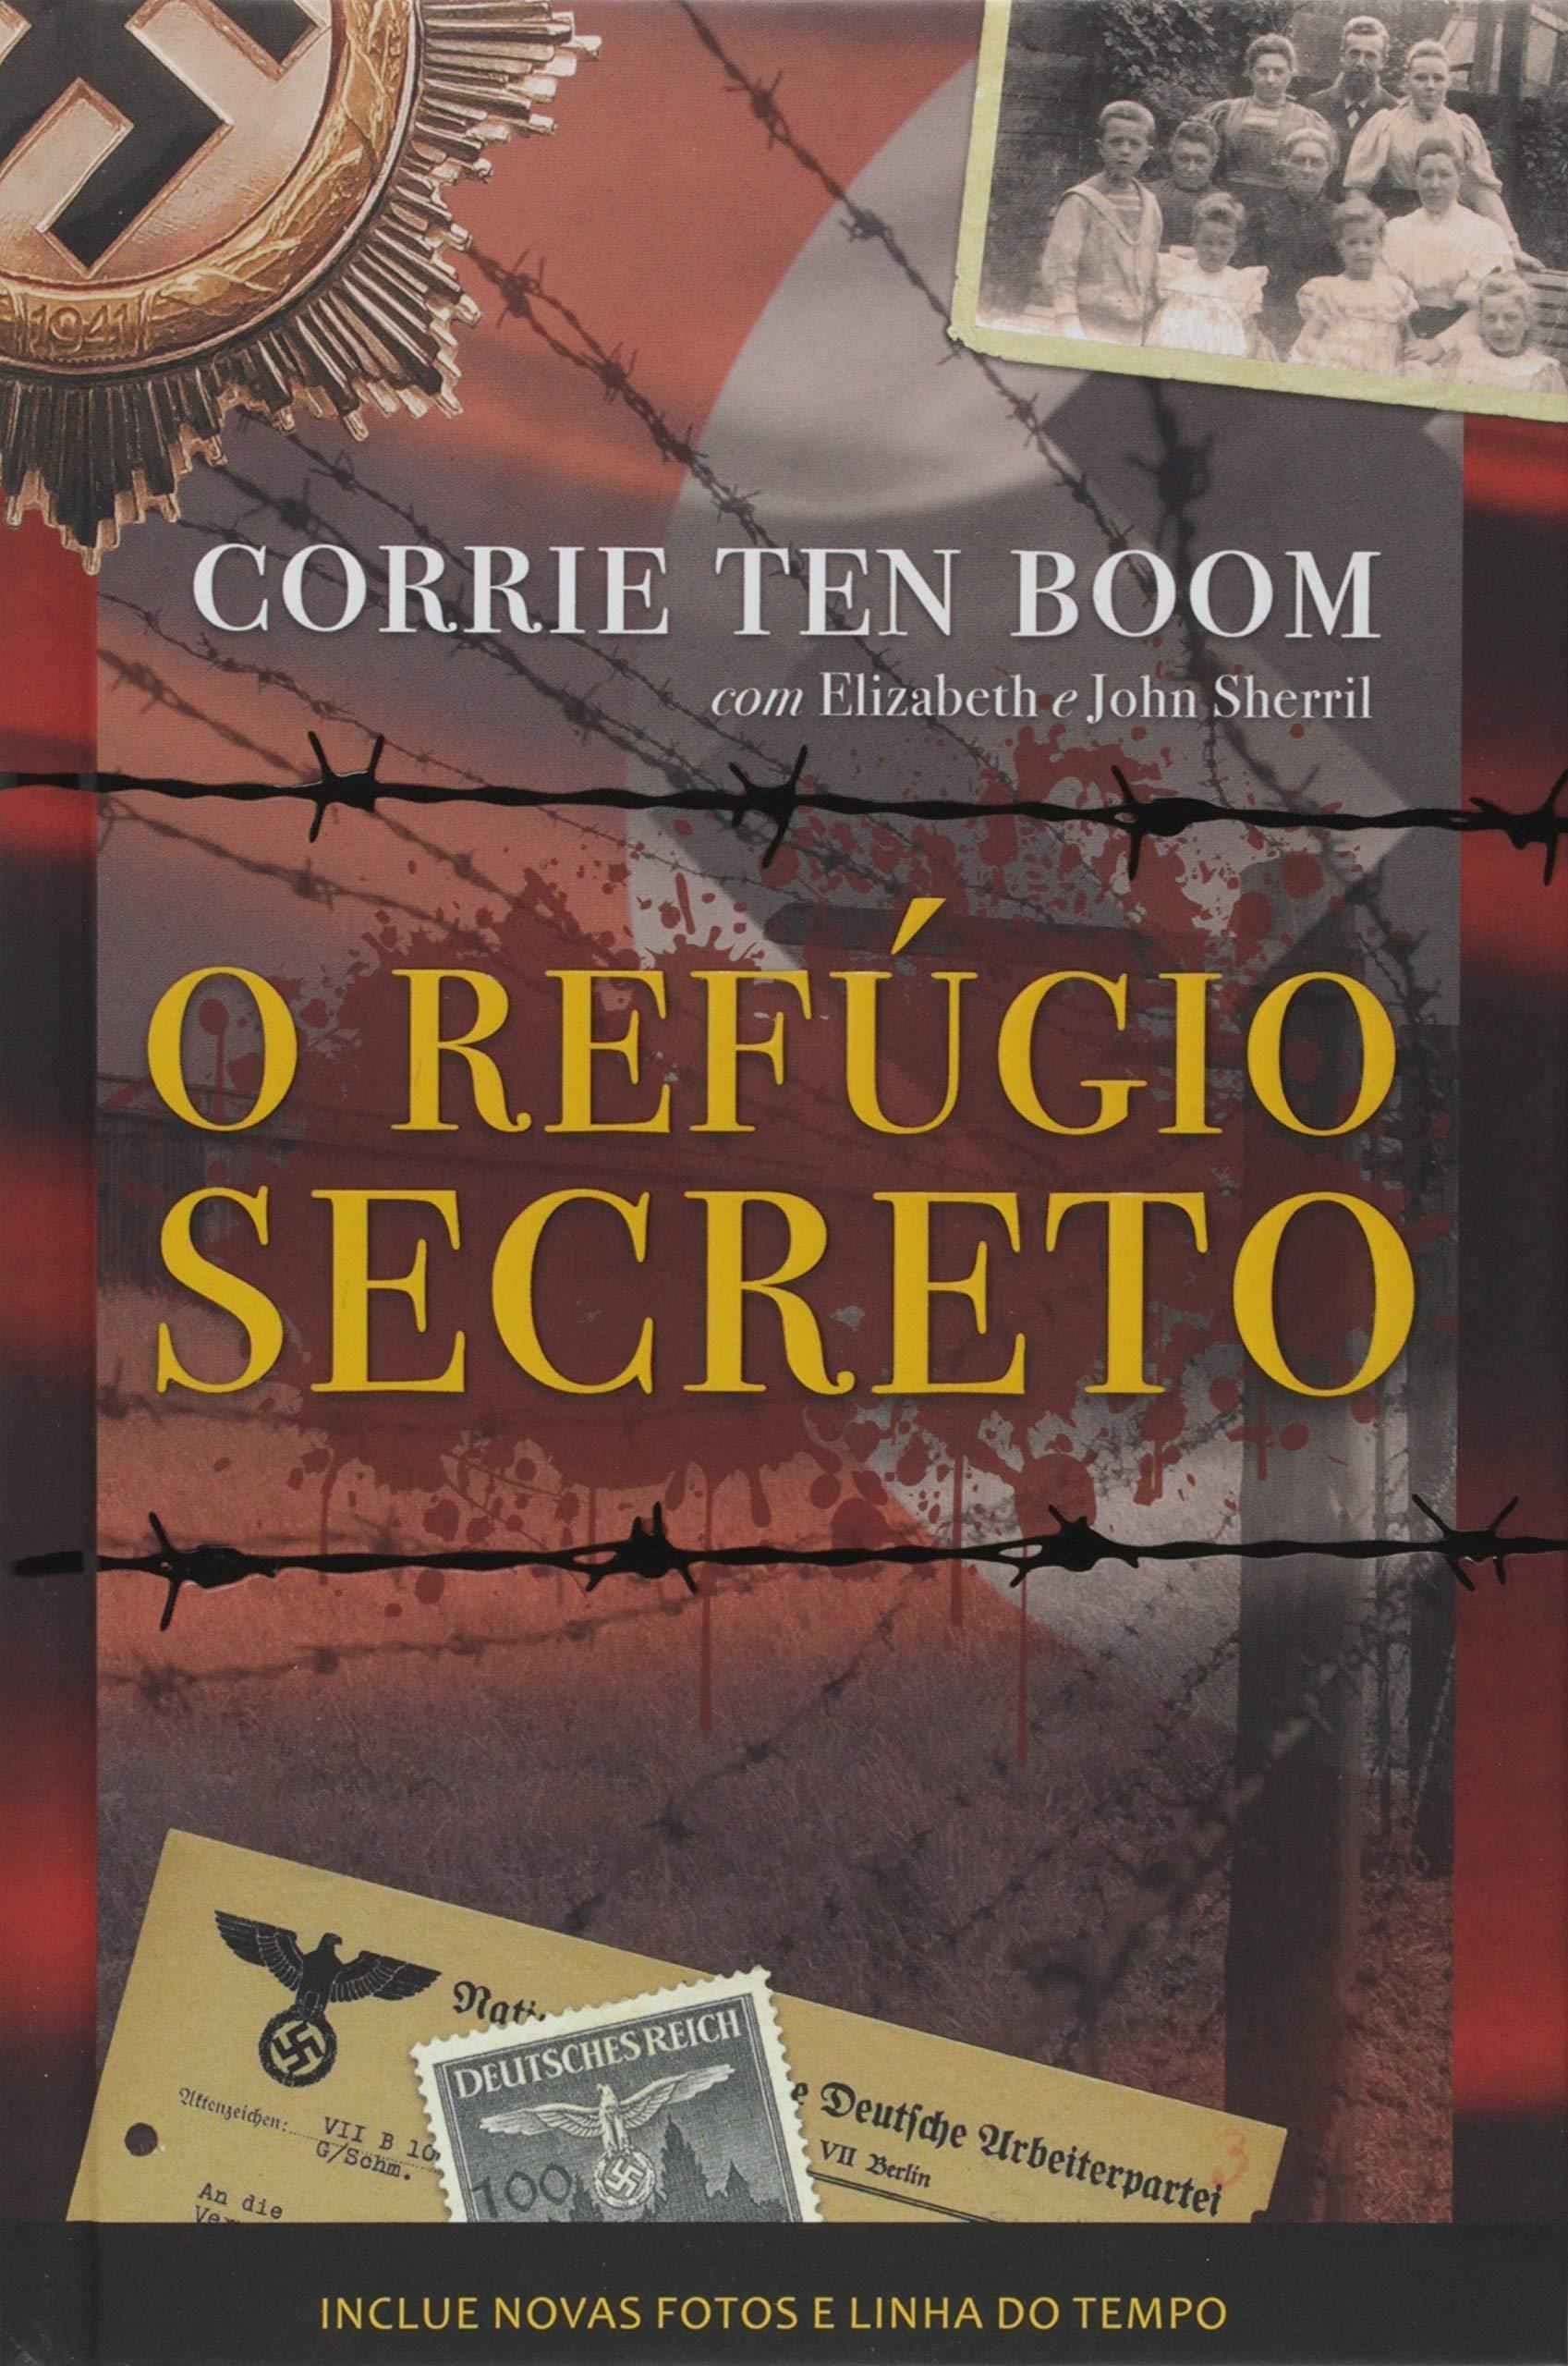 O refúgio secreto: Amazon.es: Corrie ten Boom: Libros